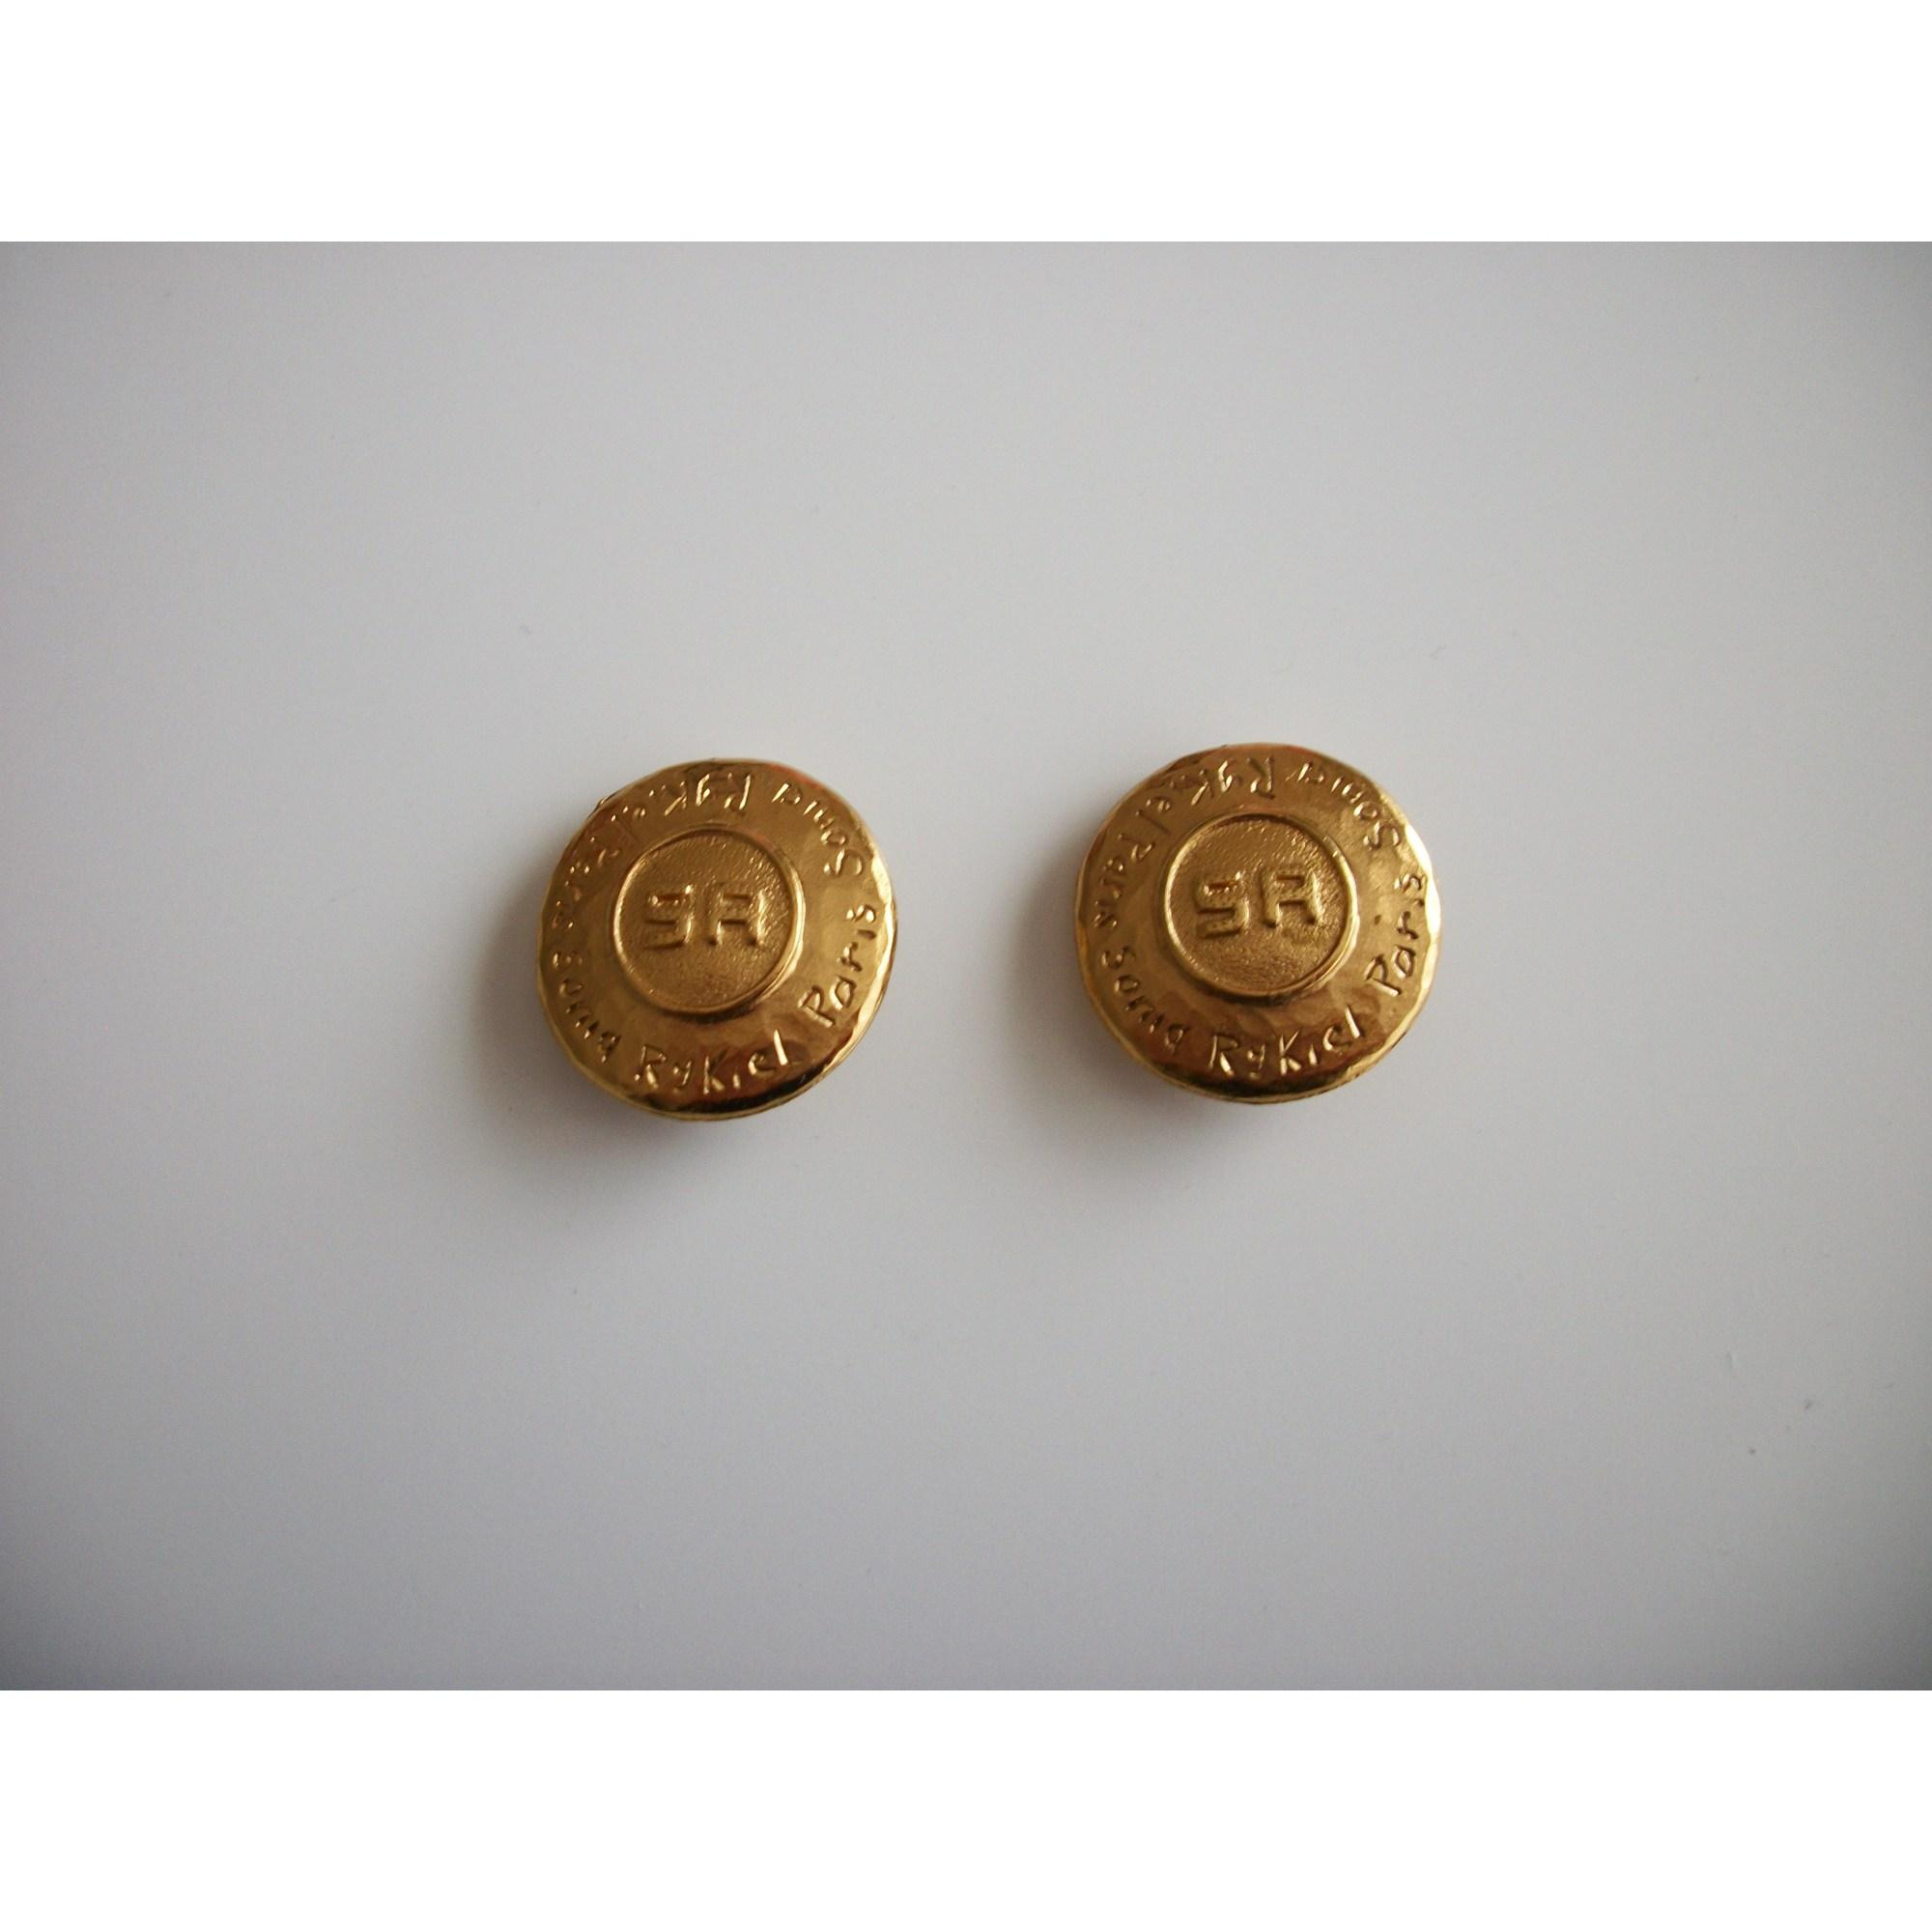 Boucles d'oreille métal doré Sonia Rykiel en coloris Métallisé XCRg